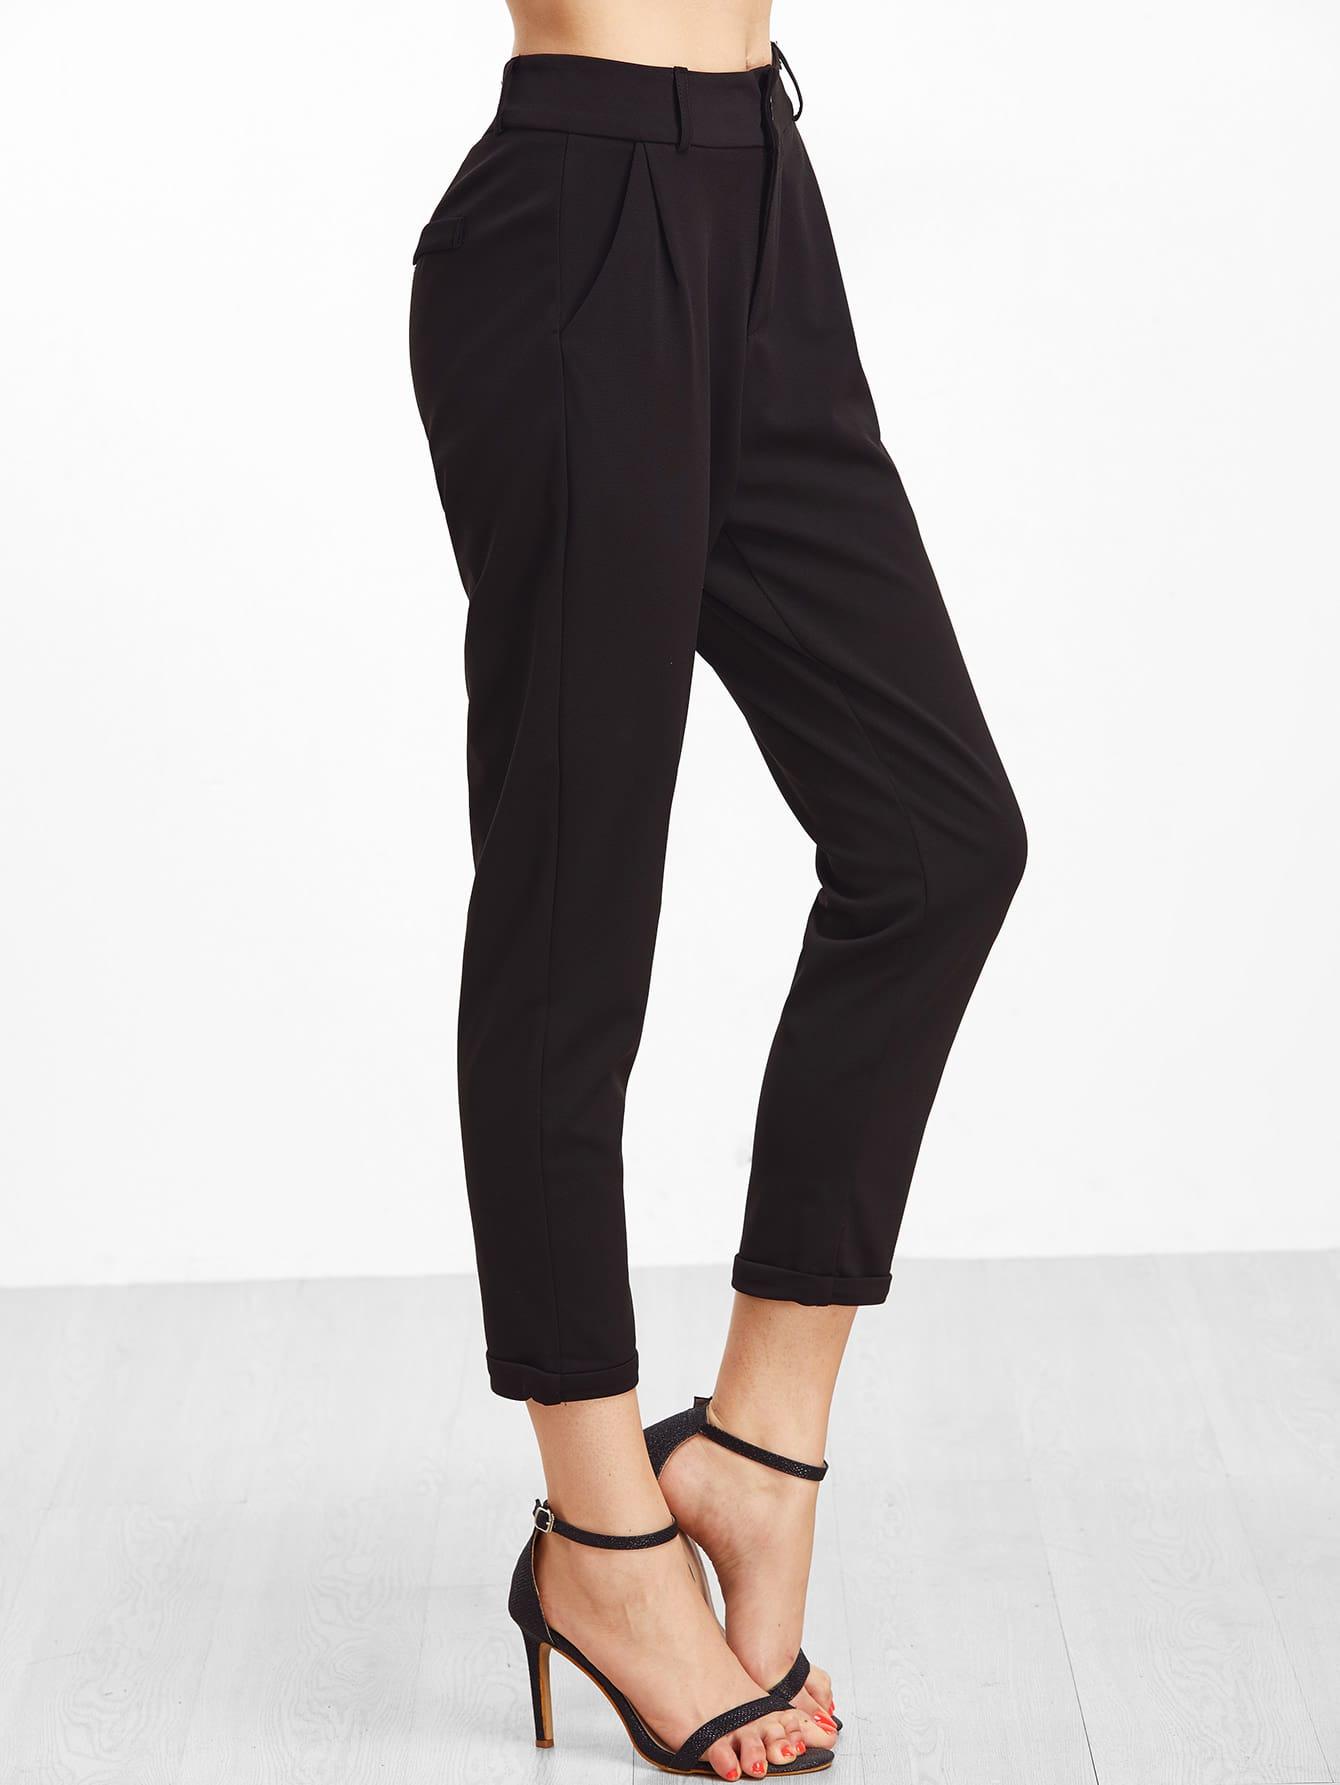 Black Cuffed Patch Pants